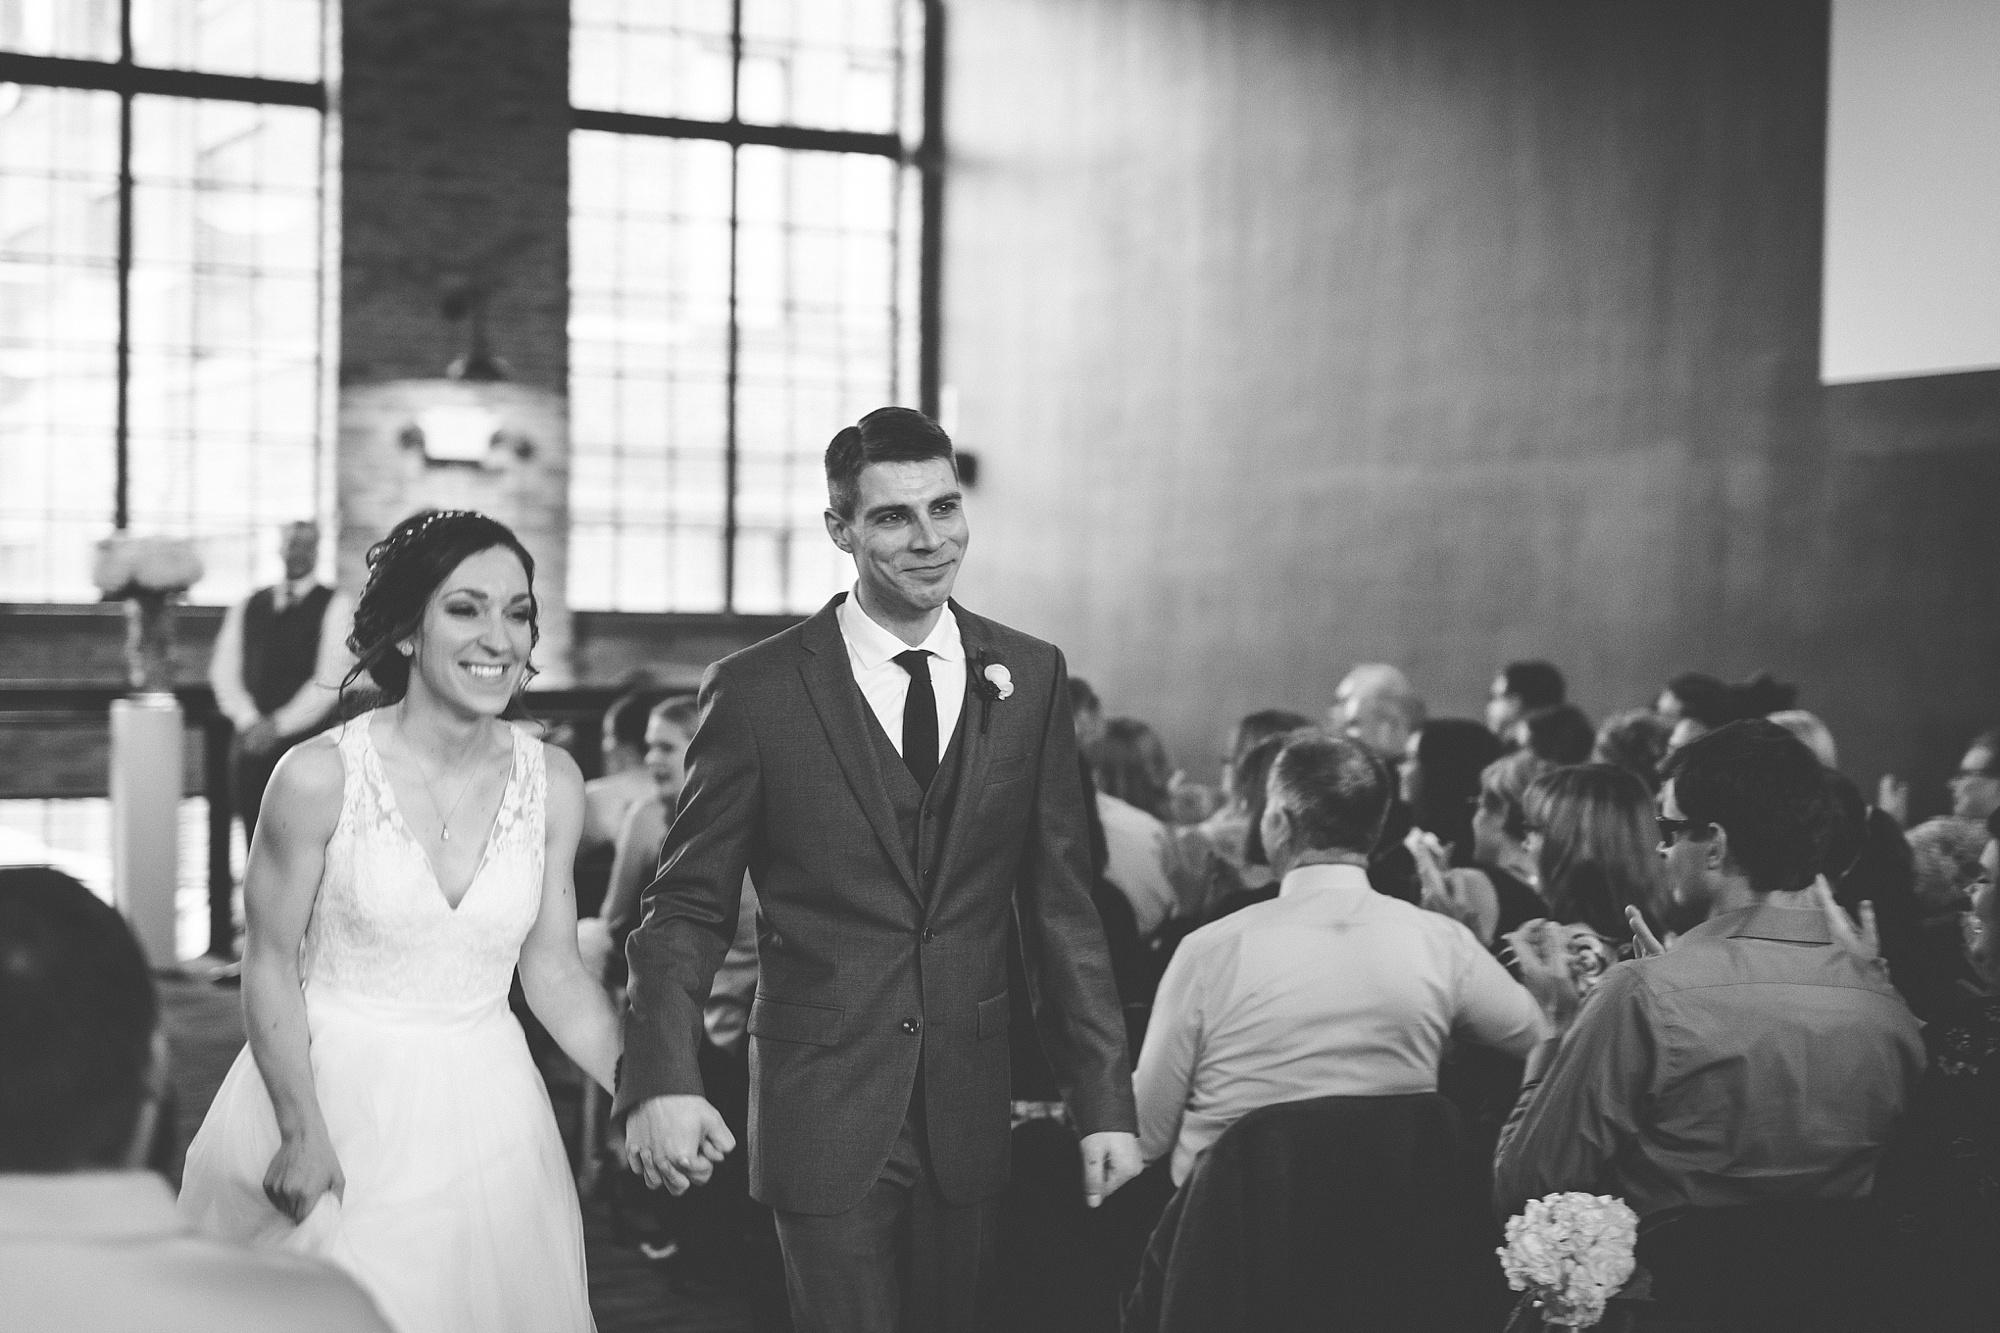 Brandon_Shafer_Photography_Lauren_Ethan_New_Vintage_Place_Grand_Rapids_Wedding_0040.jpg